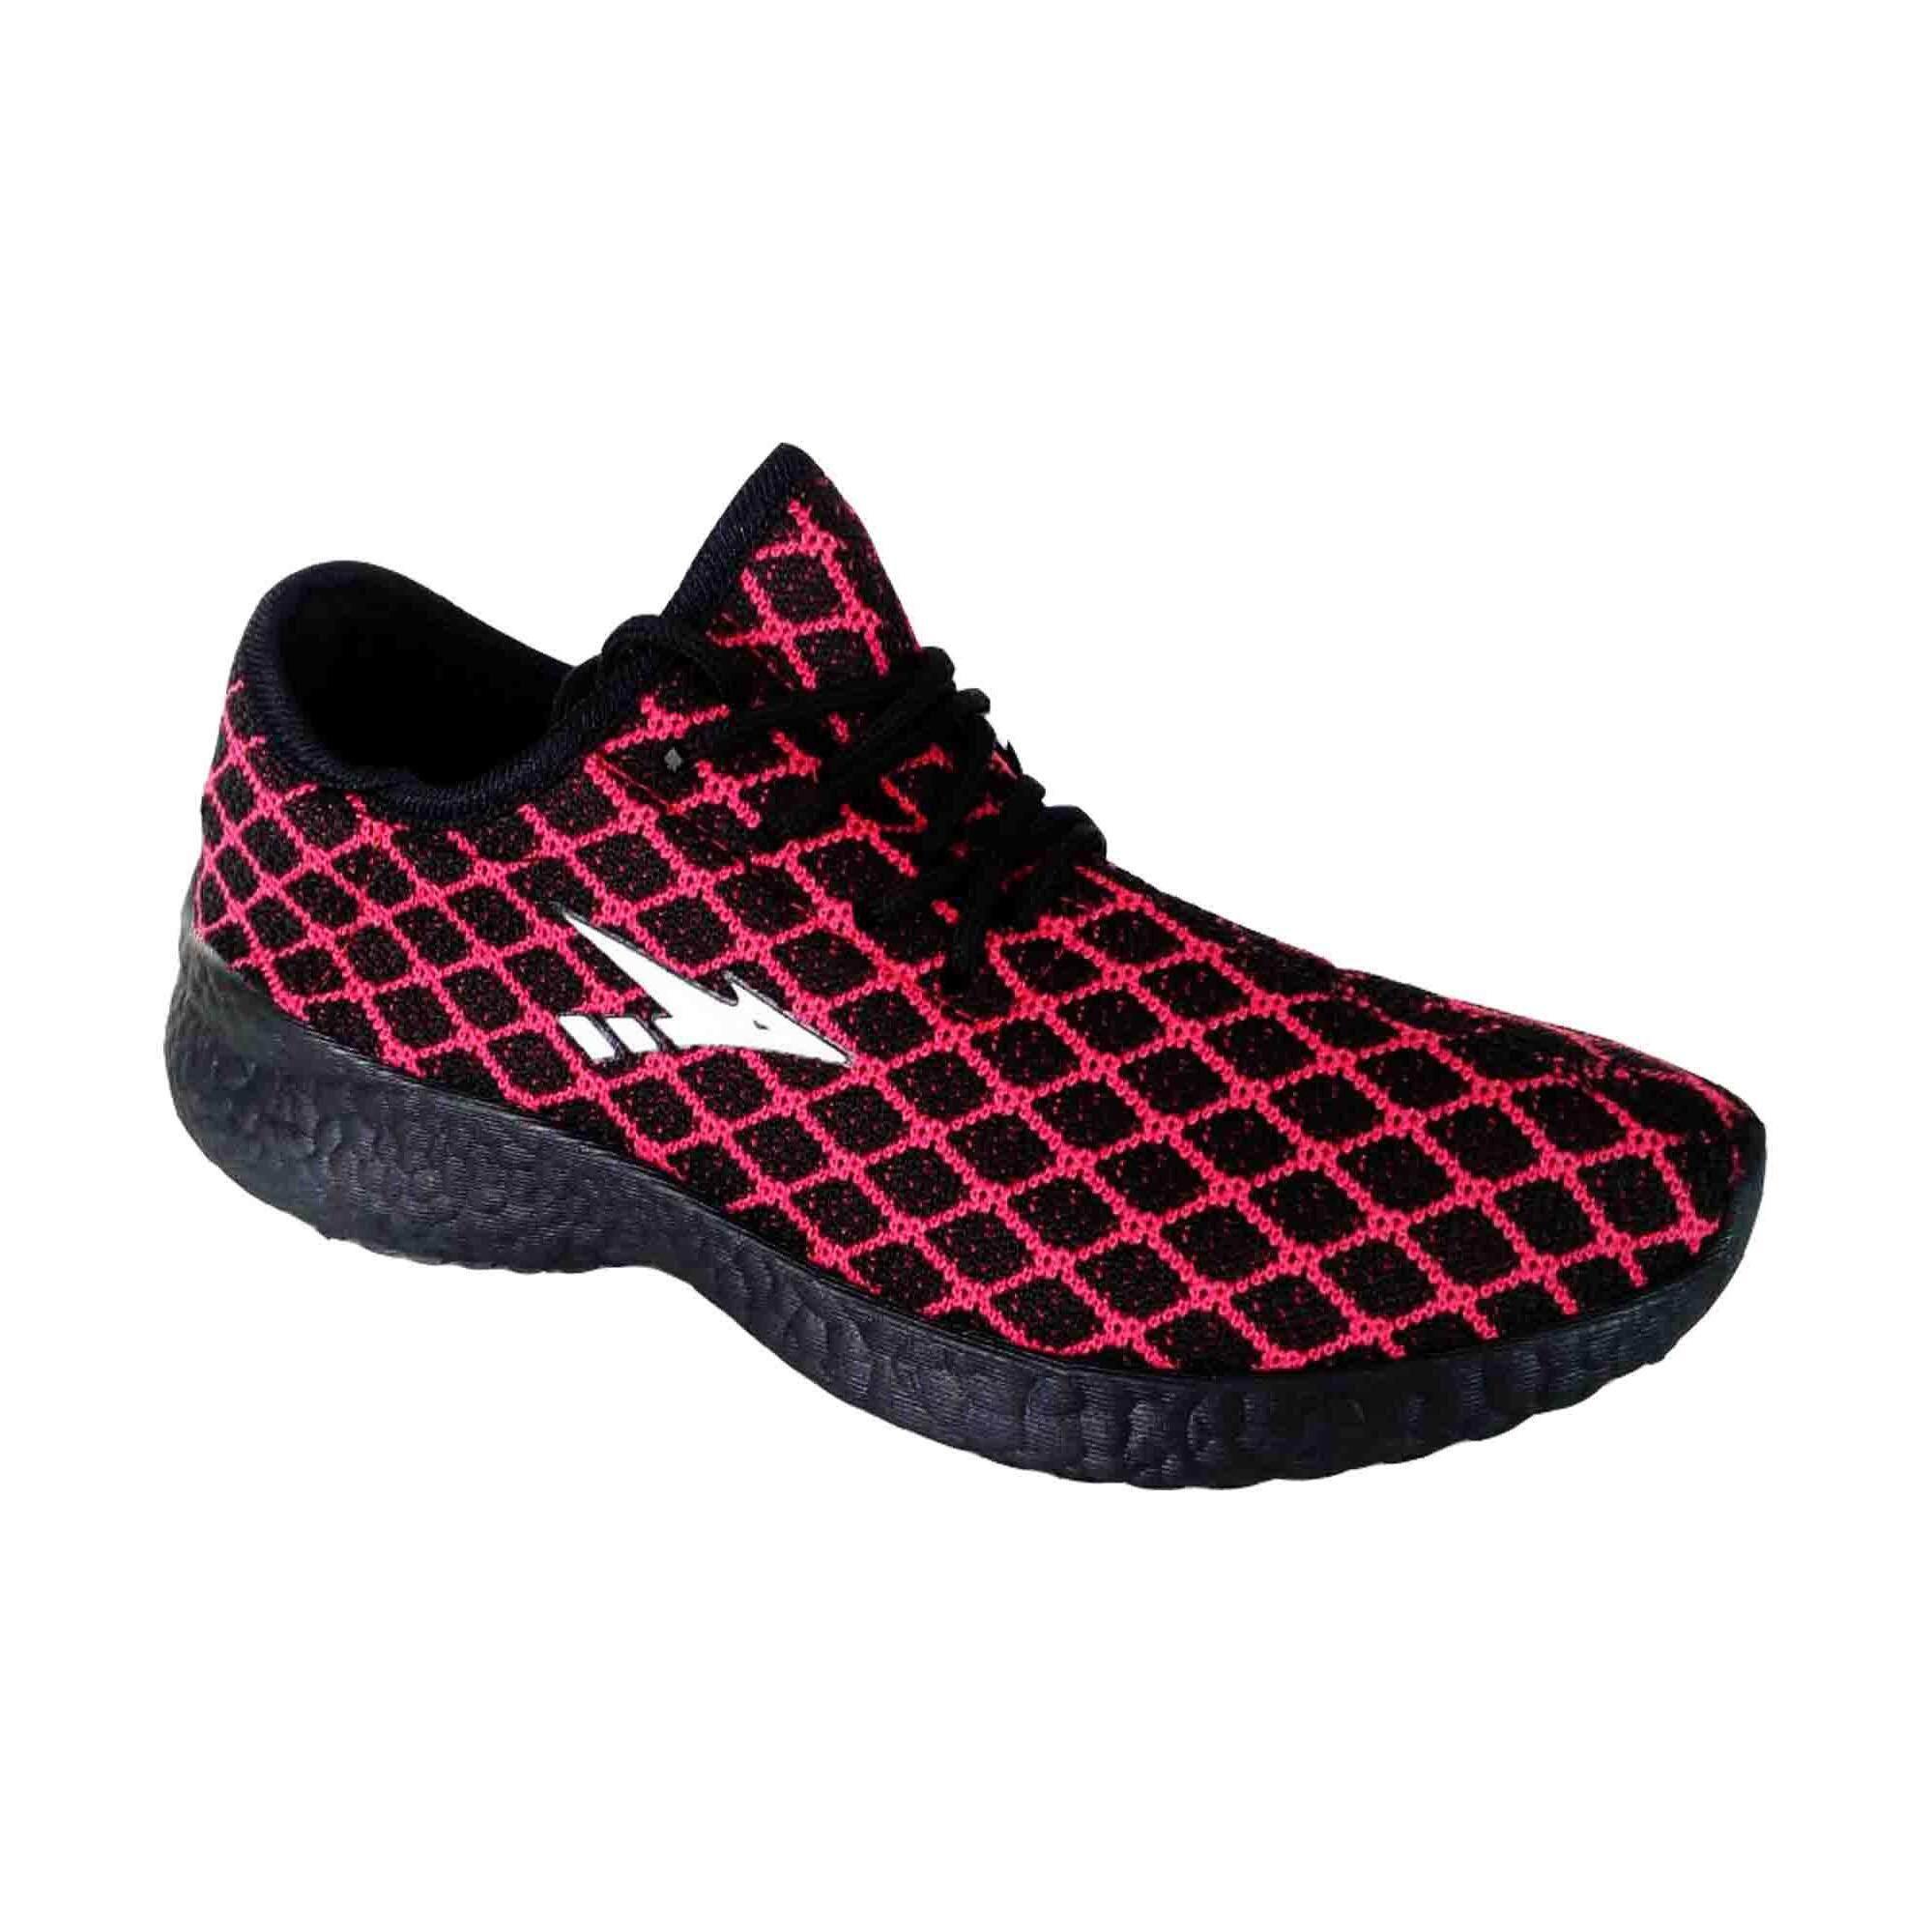 Amsdex Terra Sneakers for Women - Black/Red